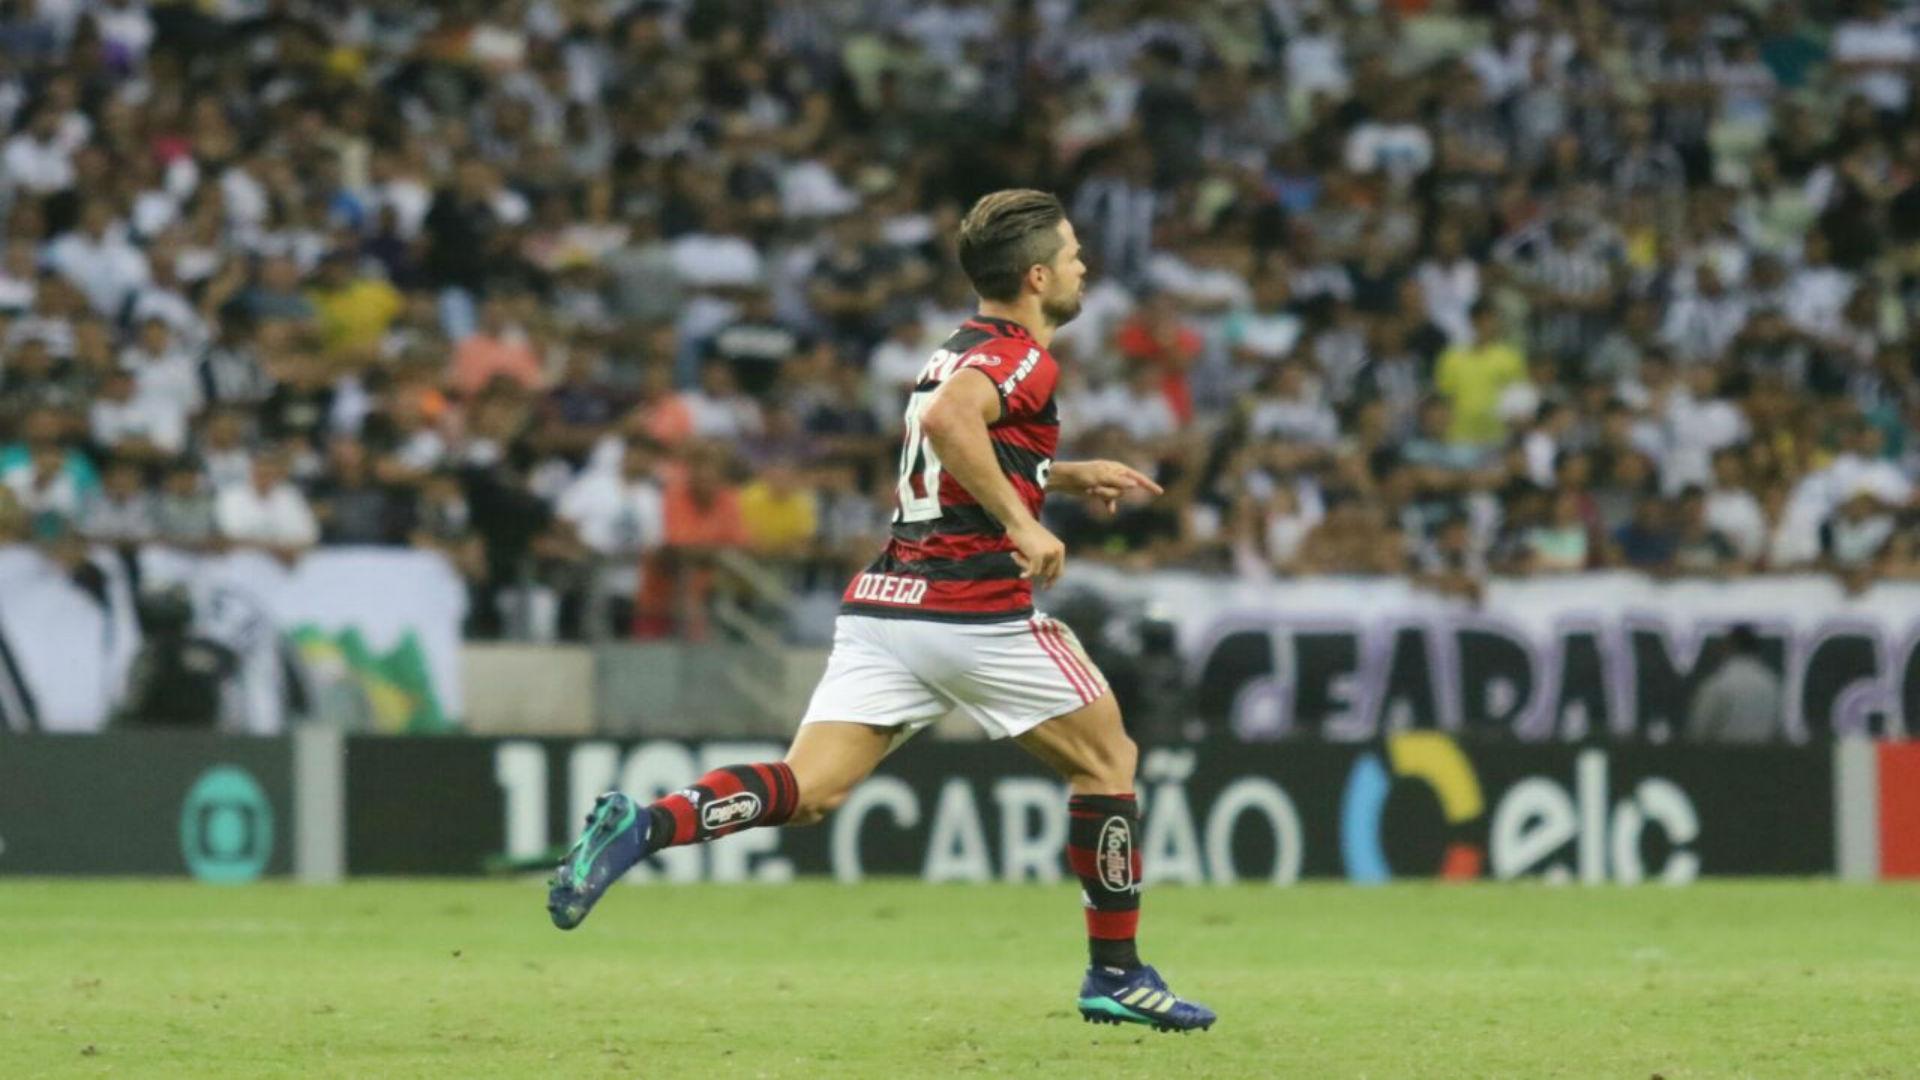 Diego Ceará x Flamengo 29042018